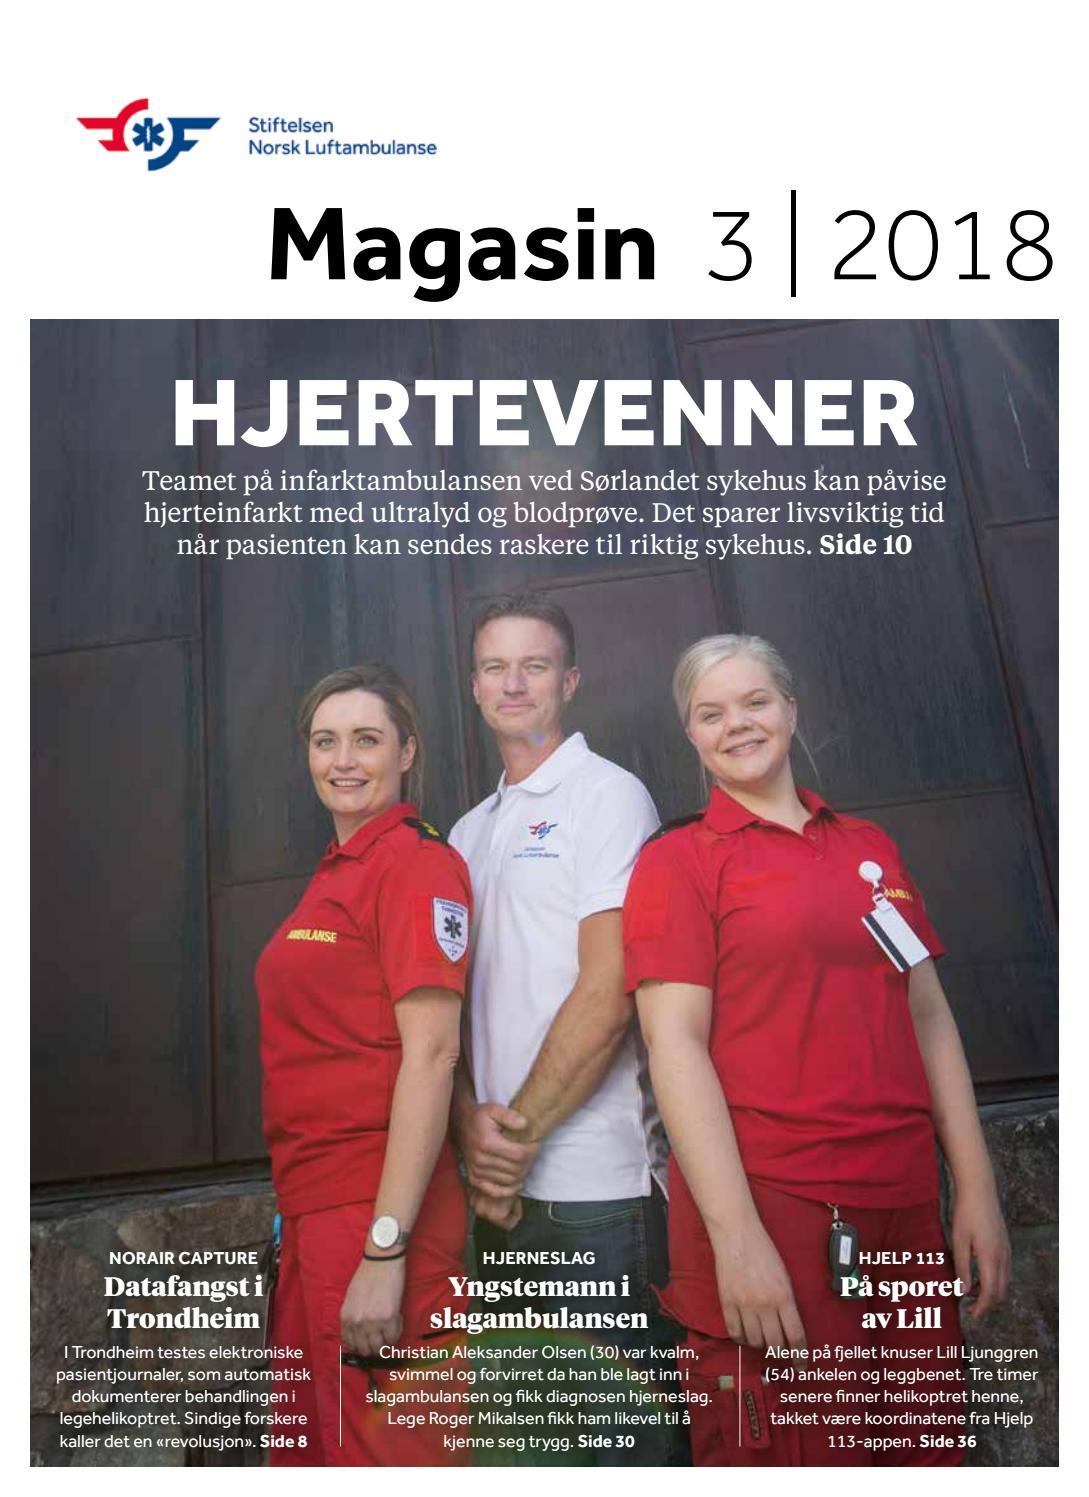 657c7f26 Stiftelsen Norsk Luftambulanse Magasin 0318 by Stiftelsen Norsk  Luftambulanse - issuu